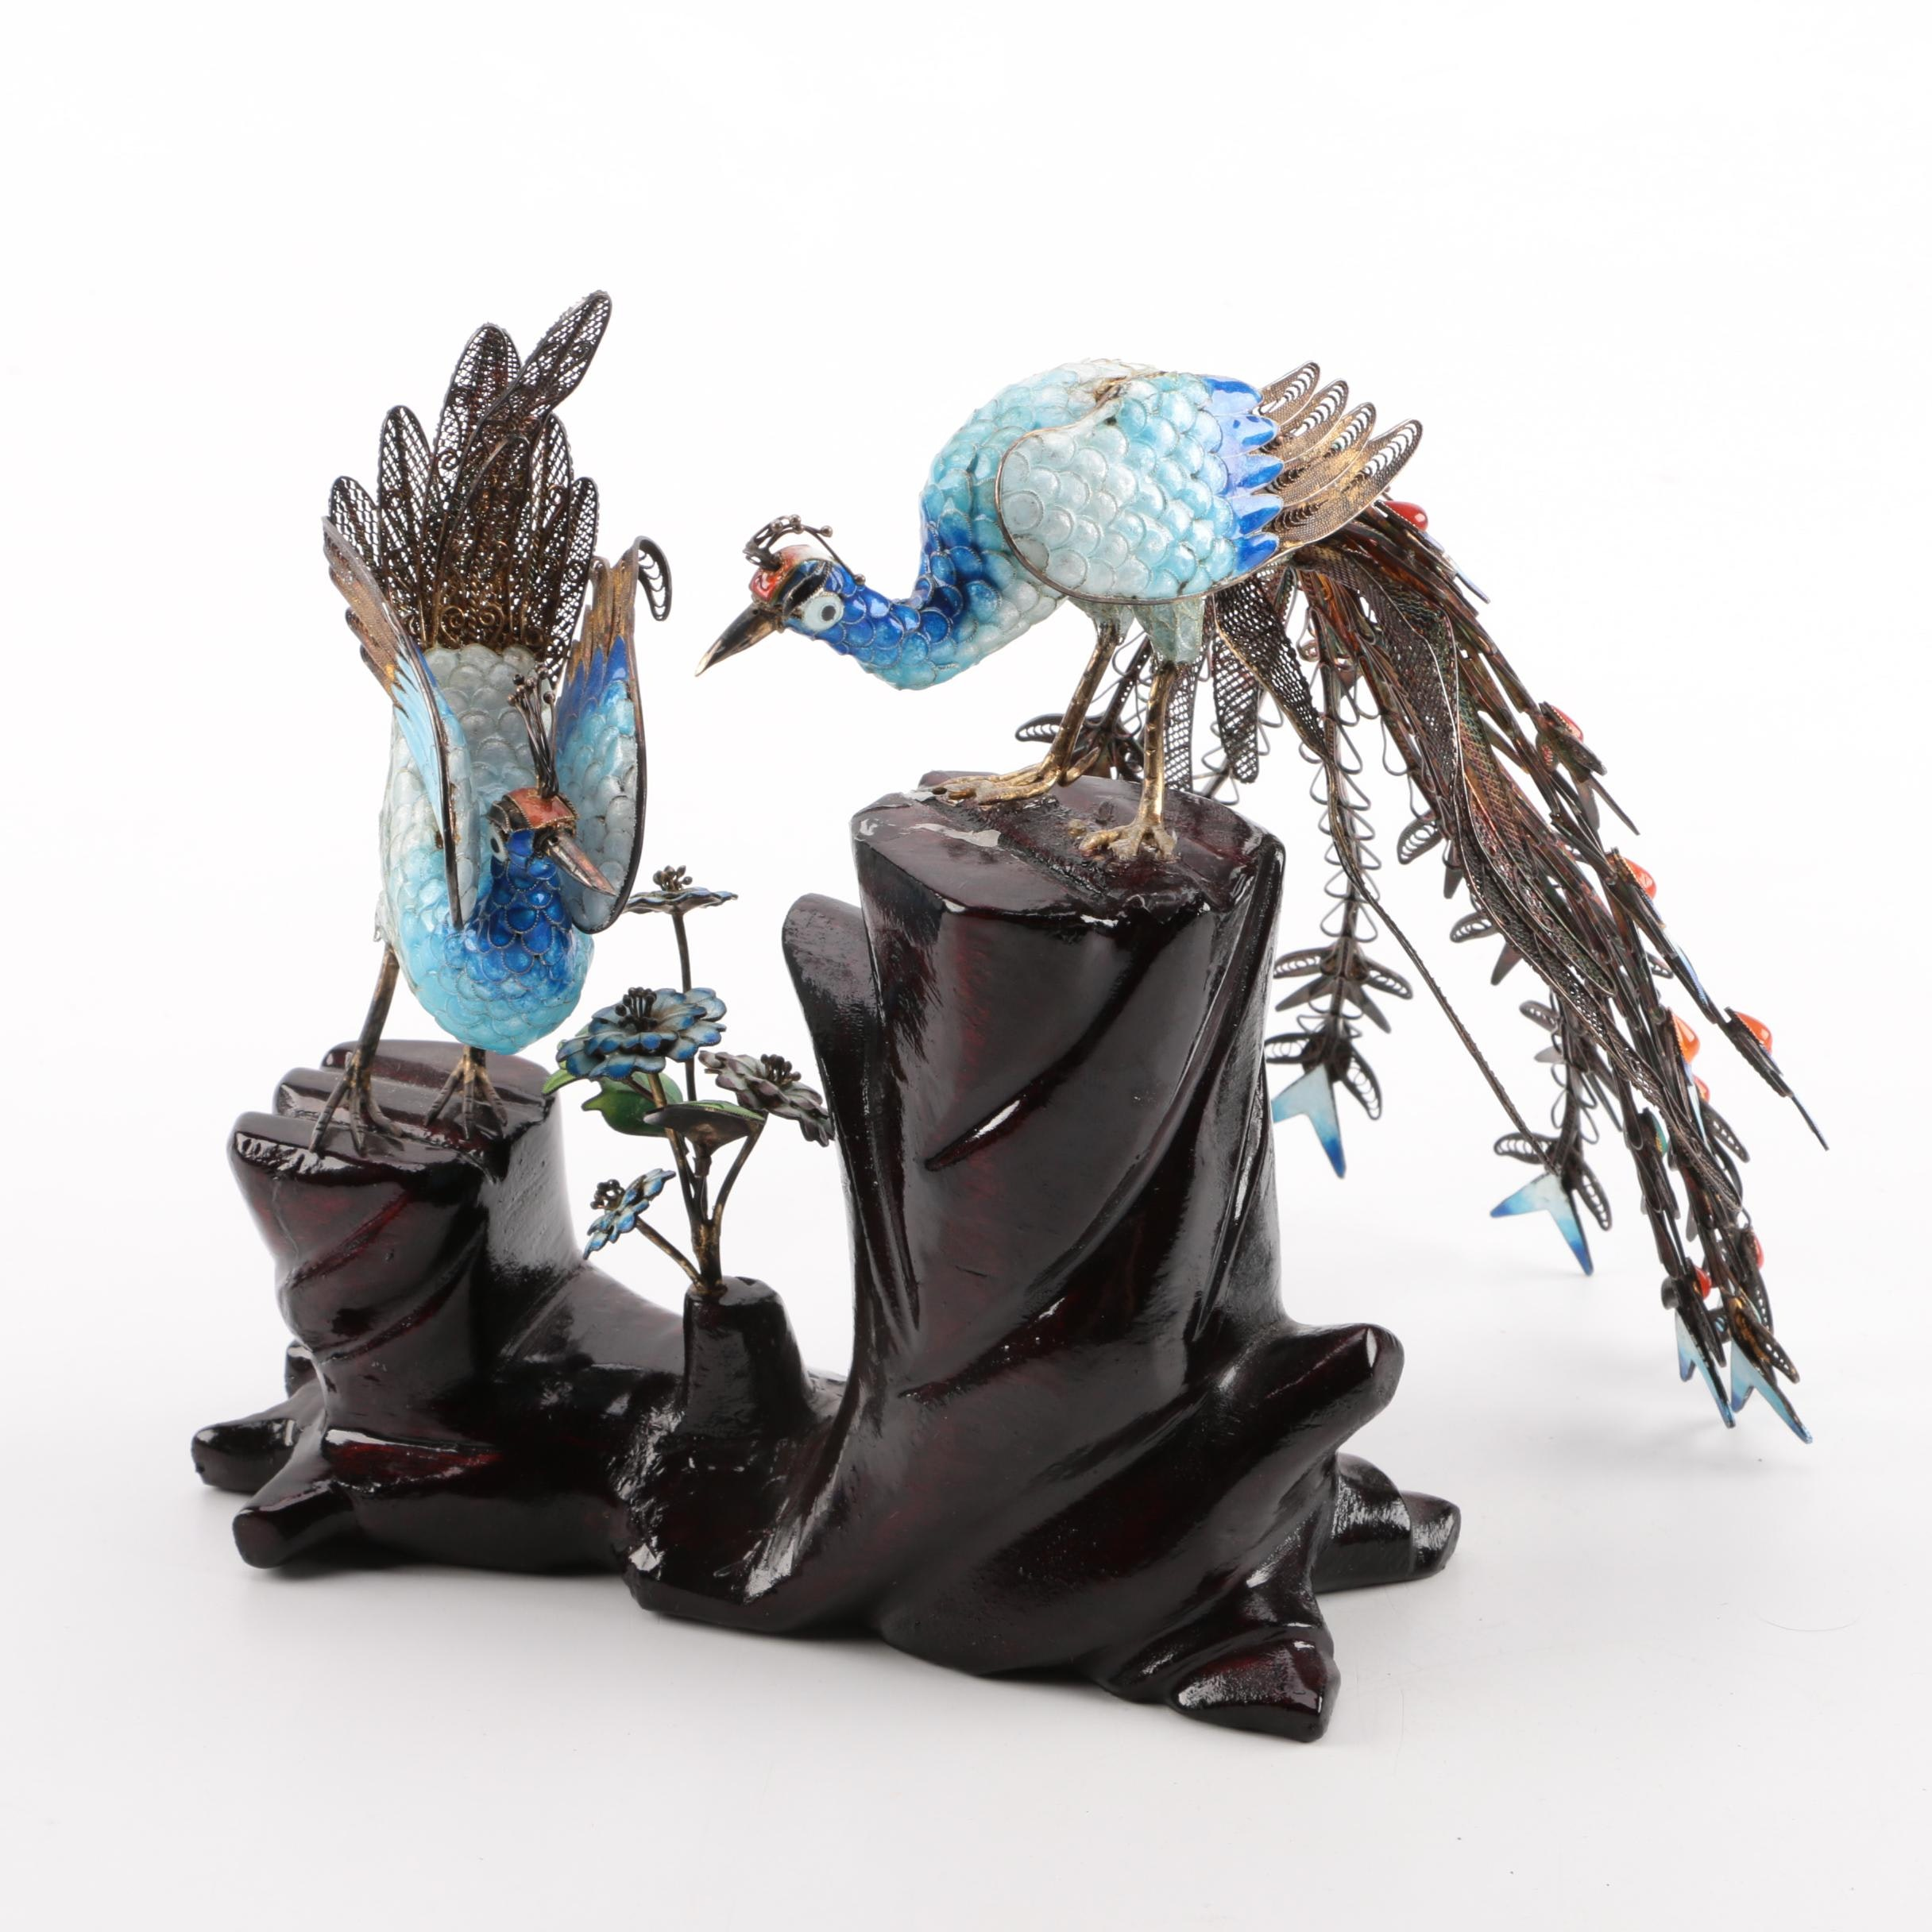 Chinese-Style Enameled Peafowl